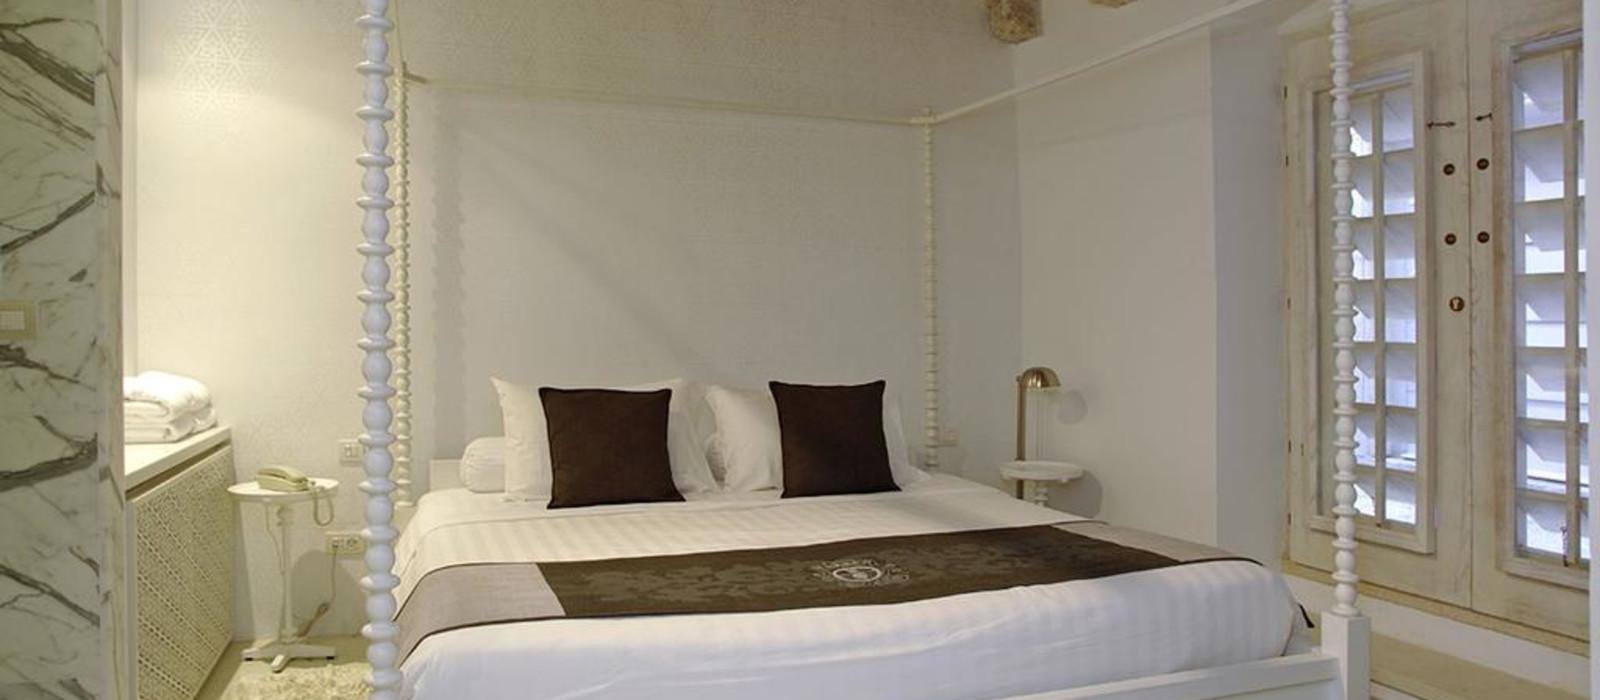 Hotel Lesic Dimitri Palace %region%